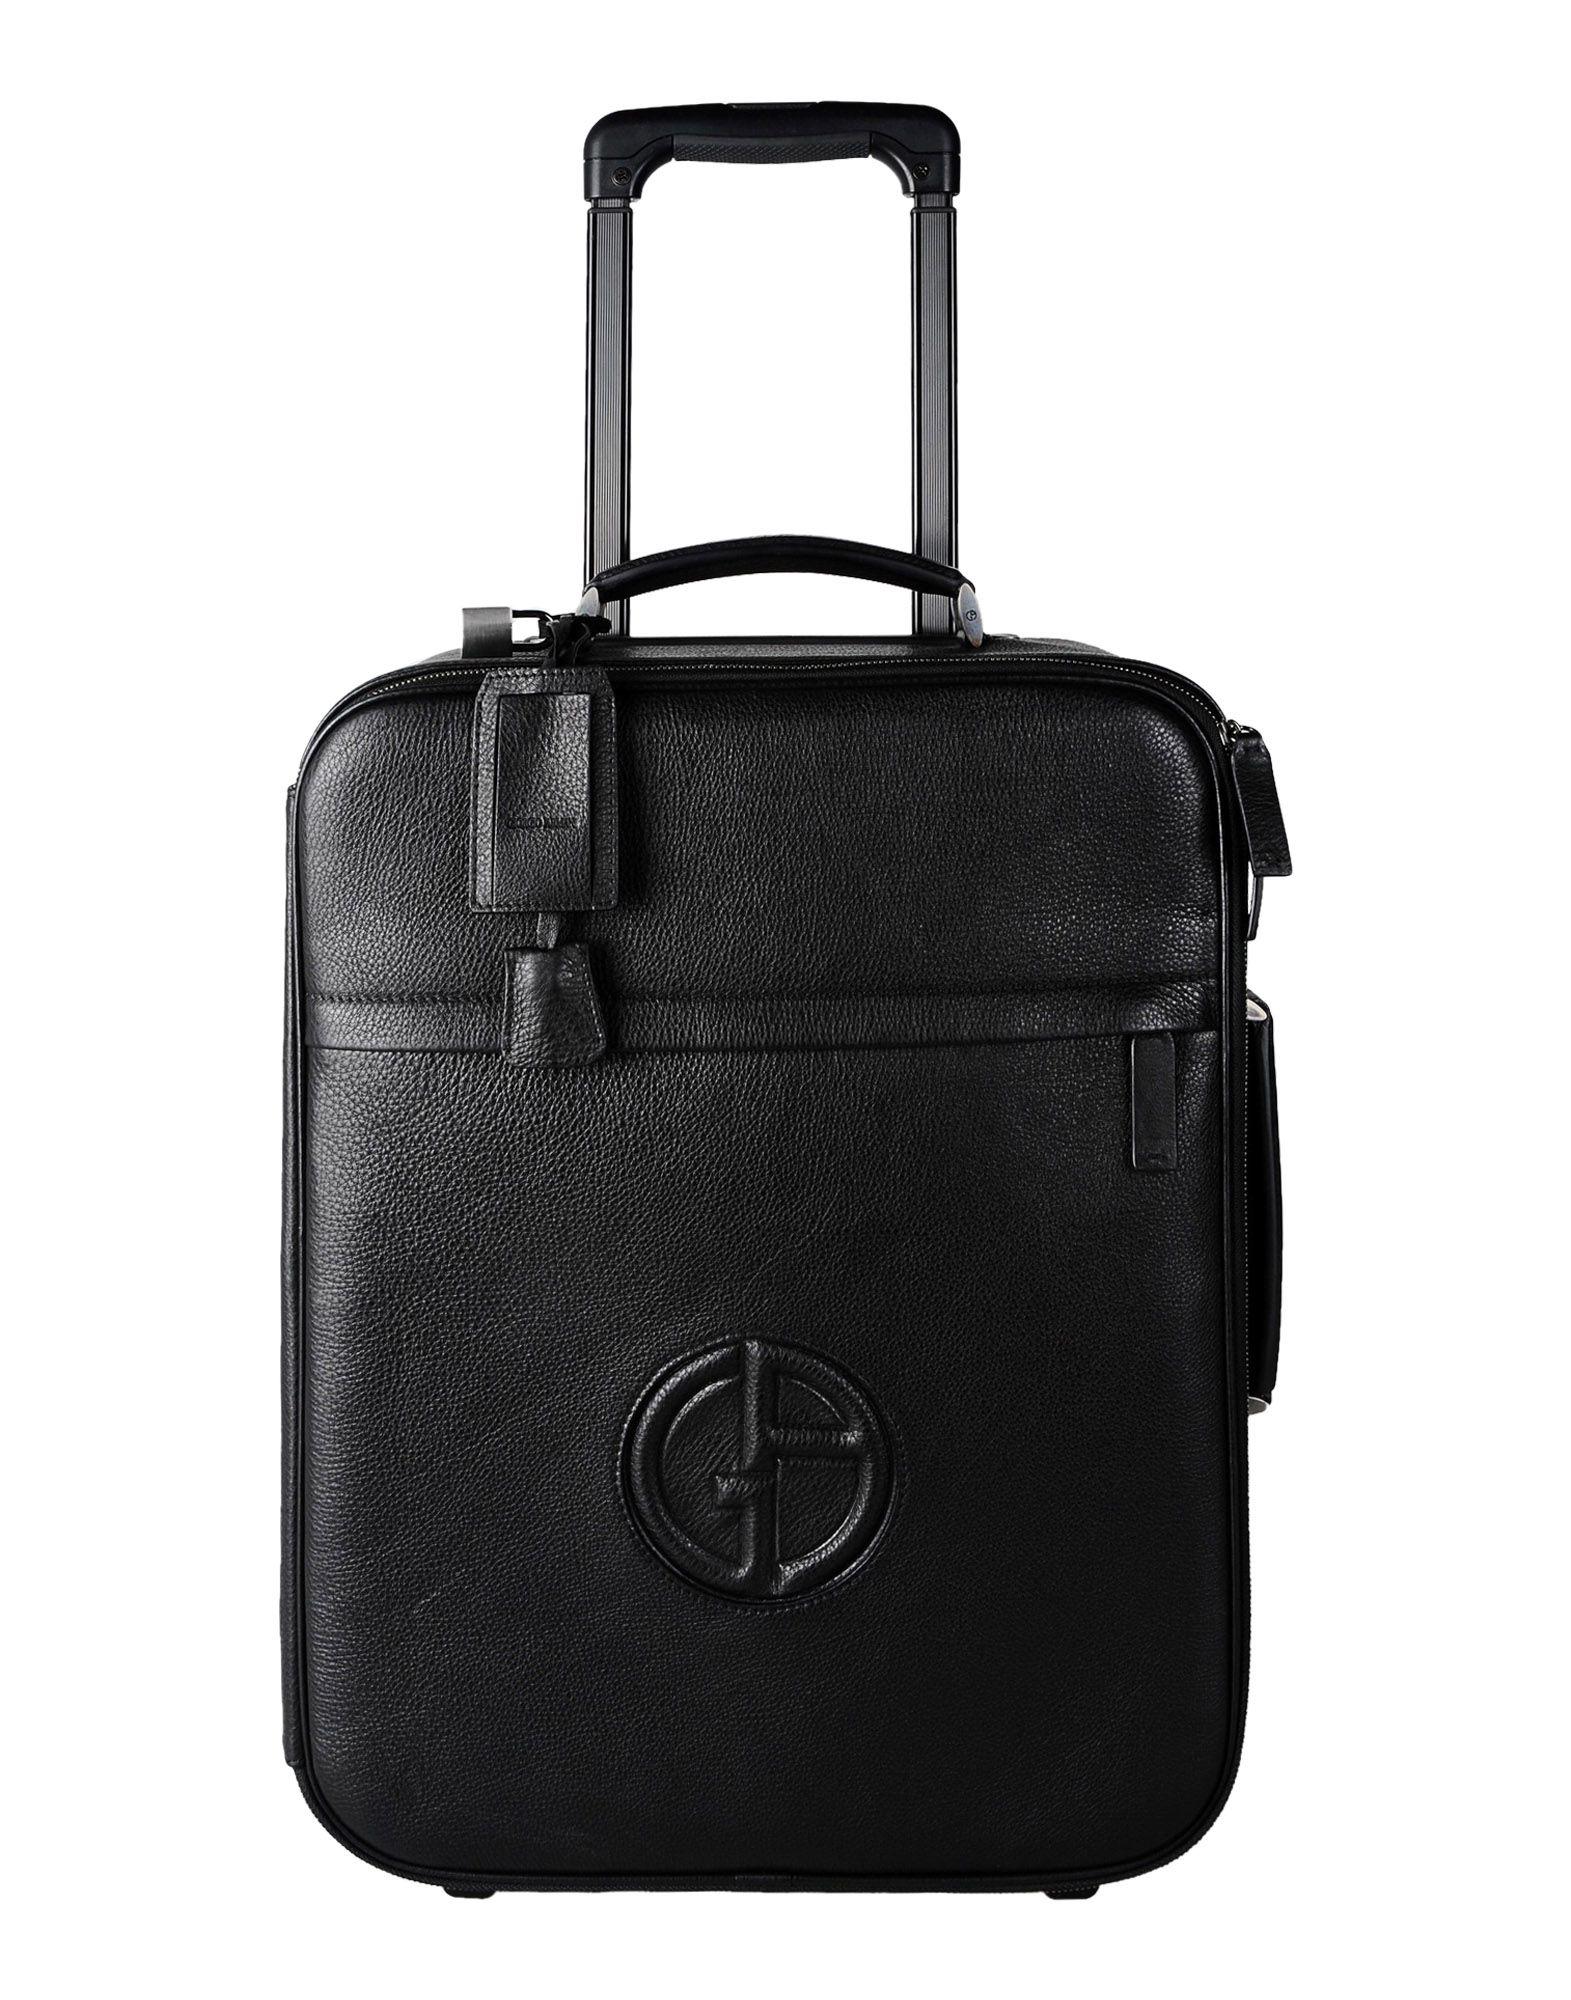 305725d6a3 Lyst - Giorgio Armani Wheeled Luggage in Black for Men